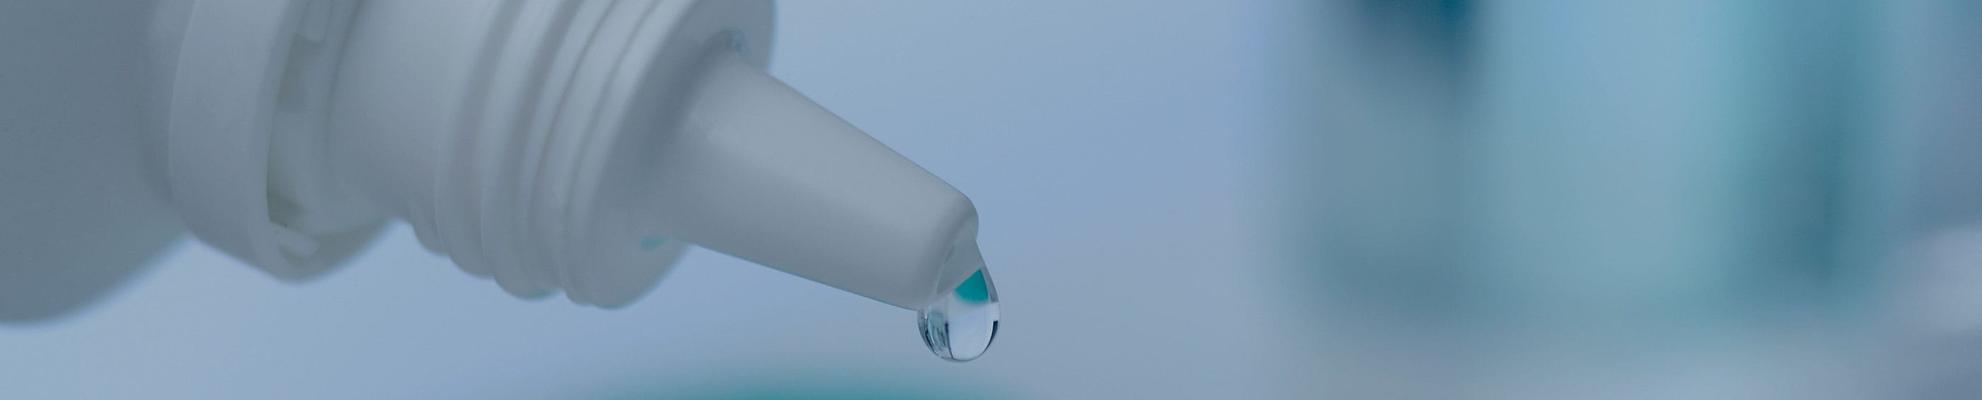 Solución para lentillas soltando gotas